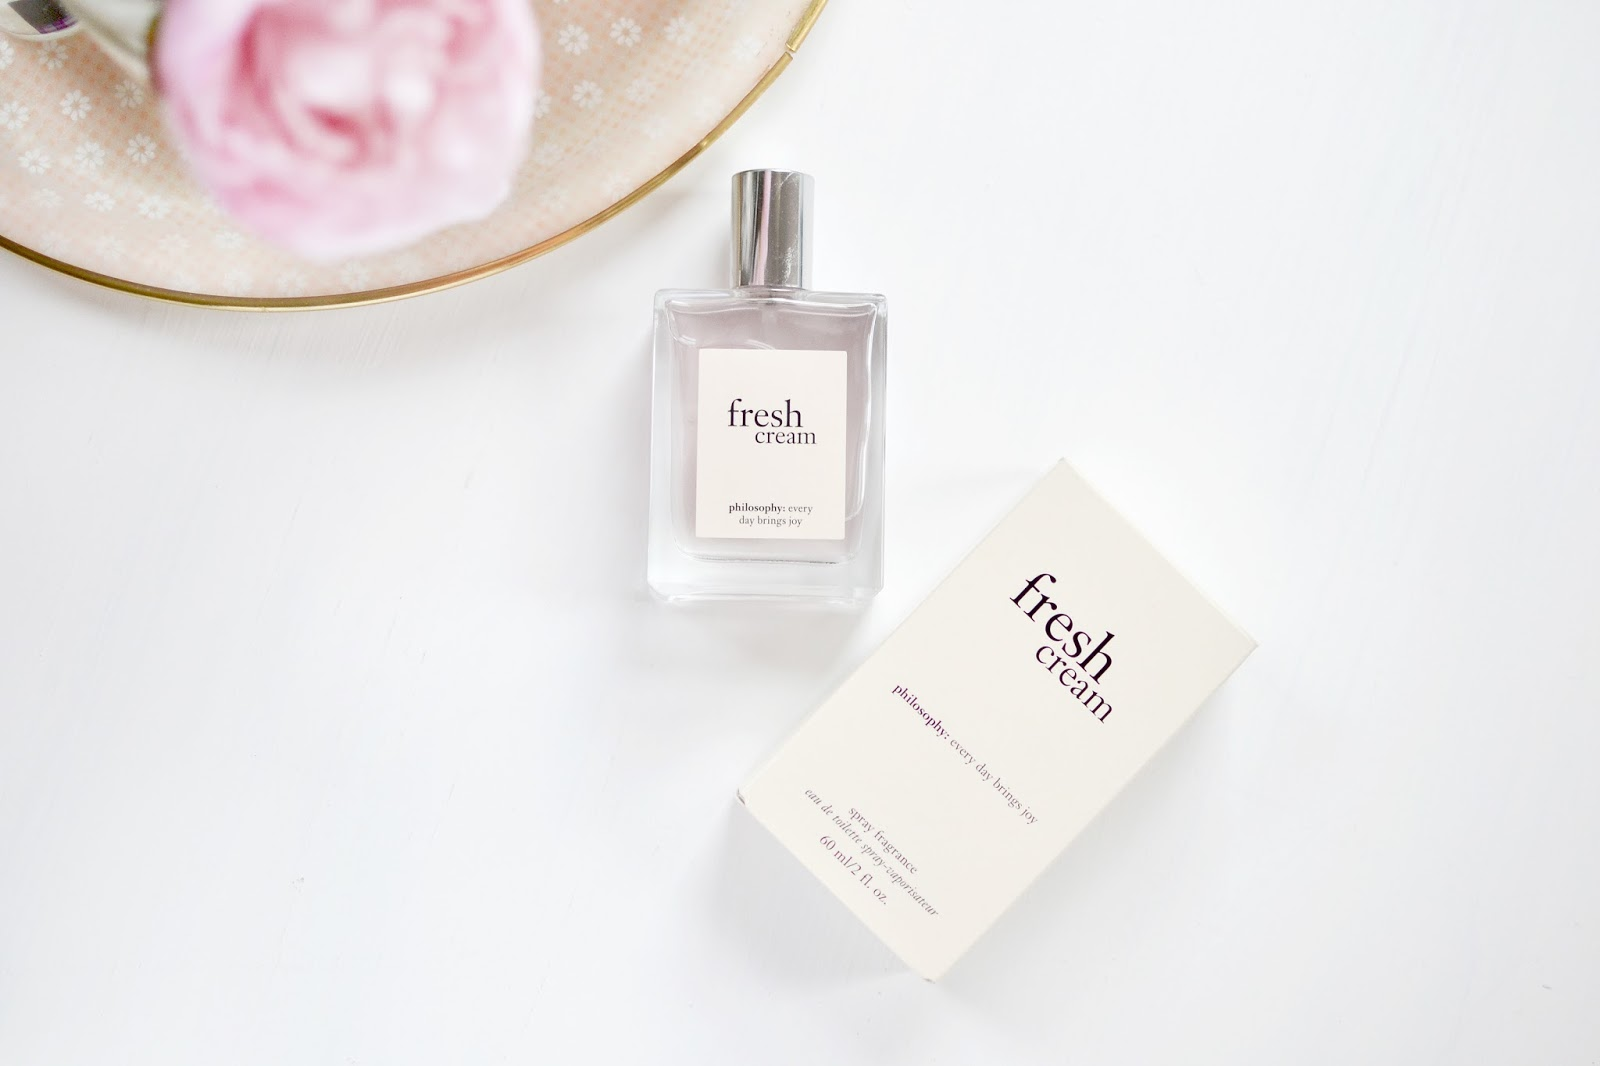 philosophy fresh cream fragrance